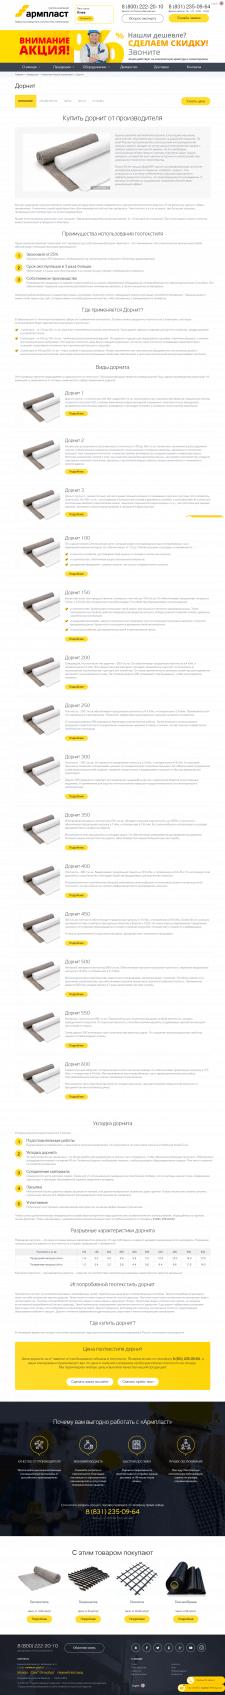 Серия описаний категорий для сайта производителя